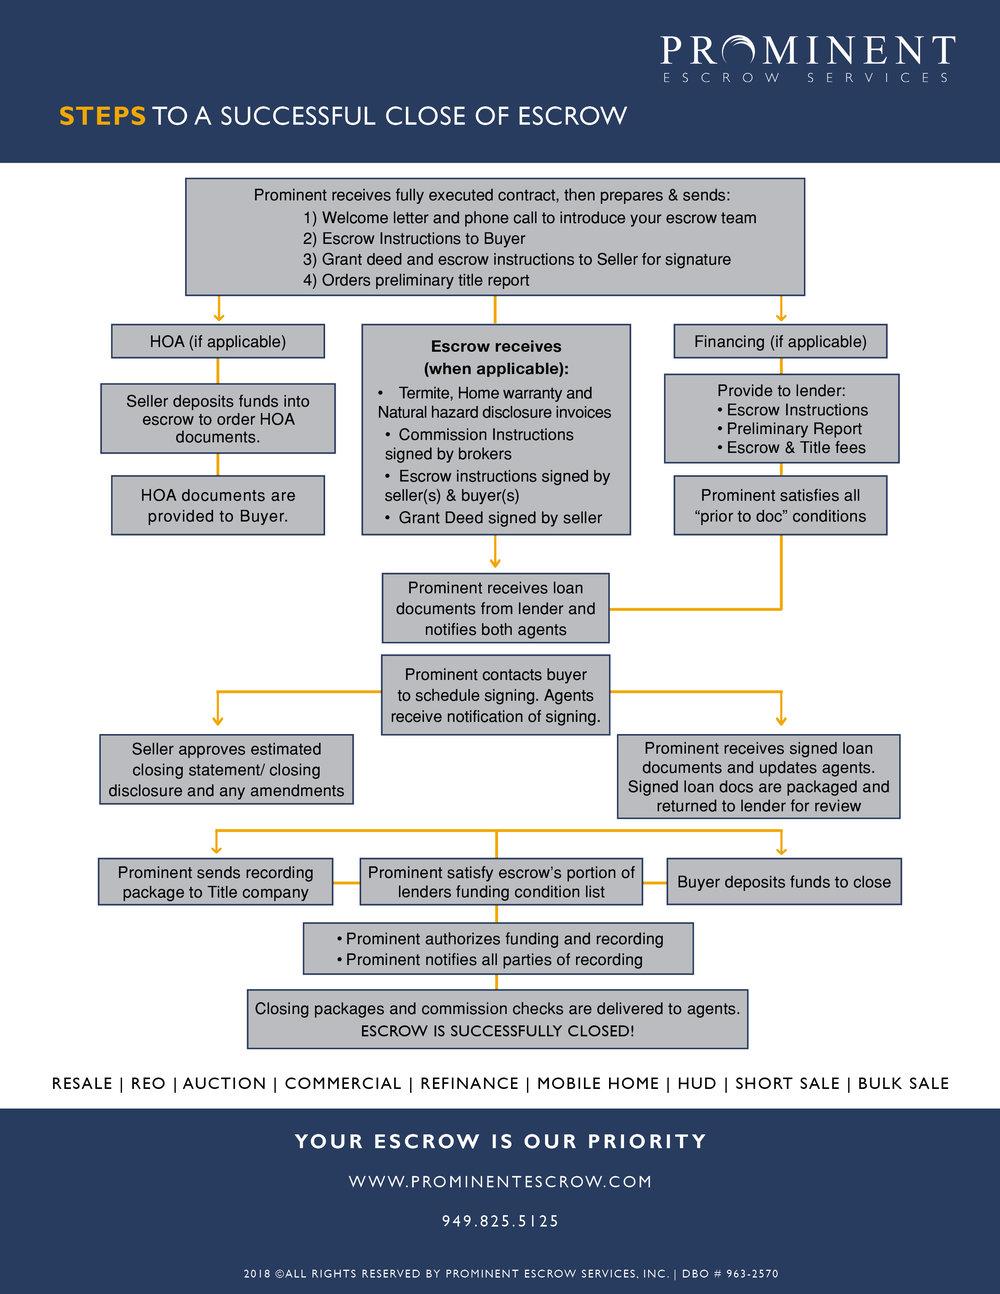 Prominent Escrow - Process Flowchart